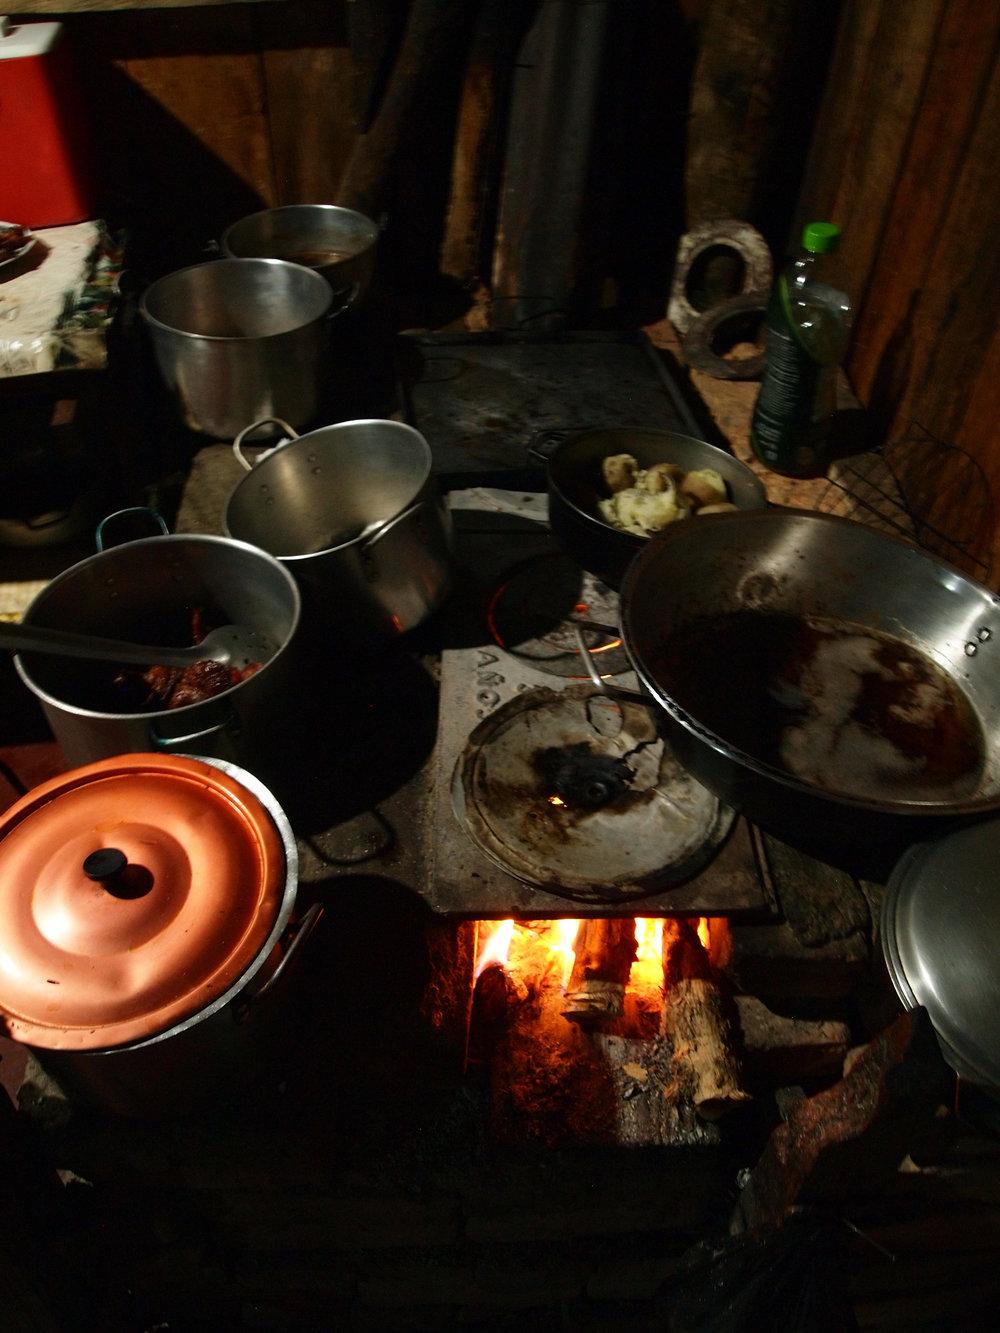 dinner-maricc81a-bercelia-mod.jpg